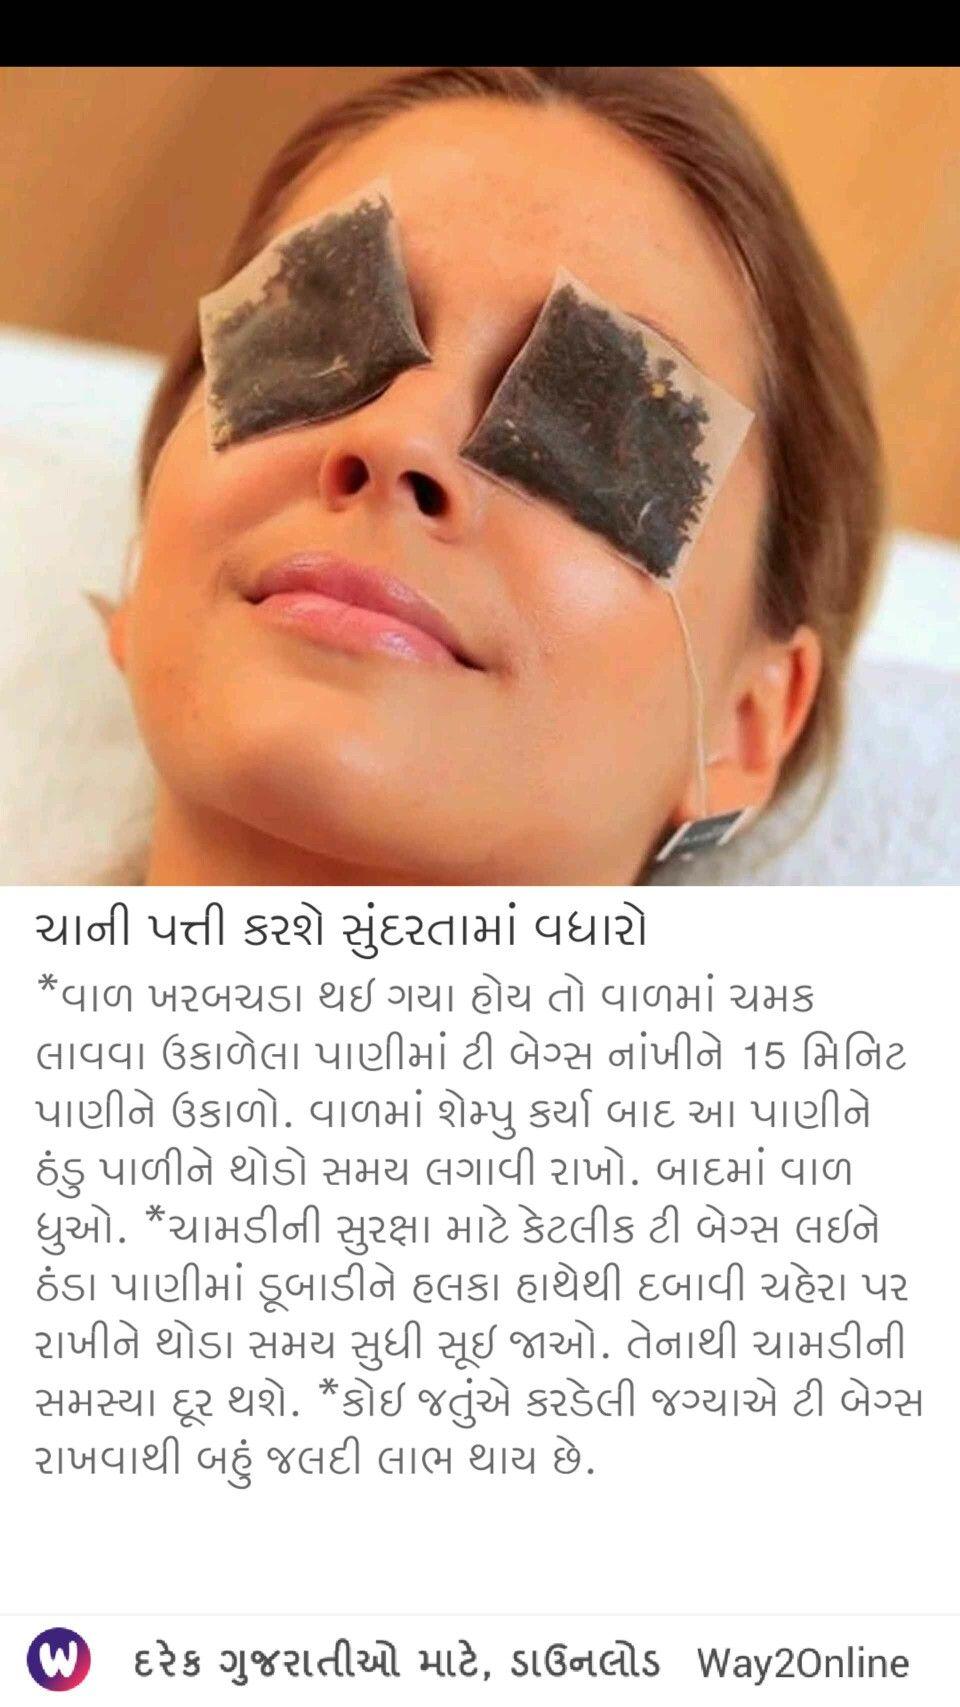 Pin by Savseta Chirag on education Sleep eye mask